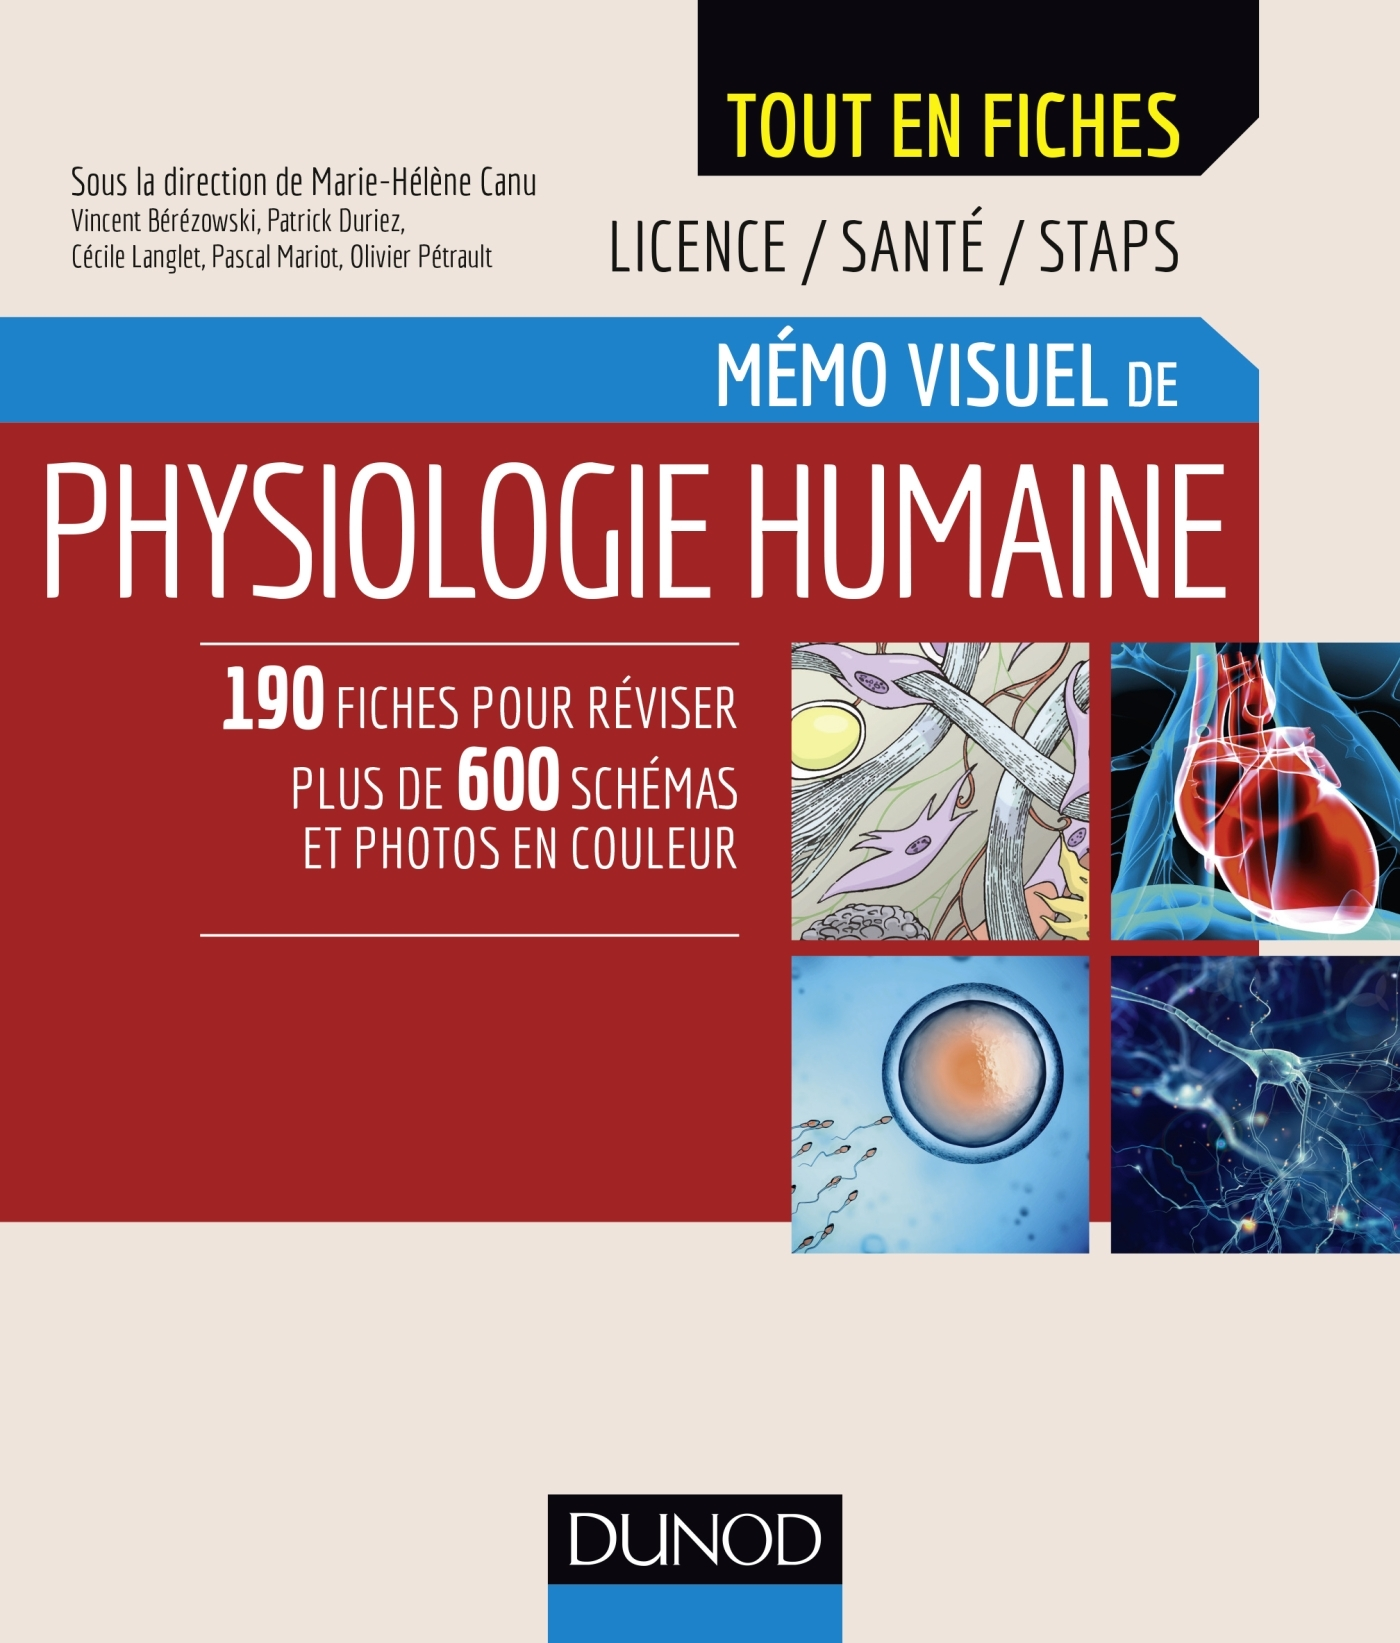 MEMO VISUEL DE PHYSIOLOGIE HUMAINE